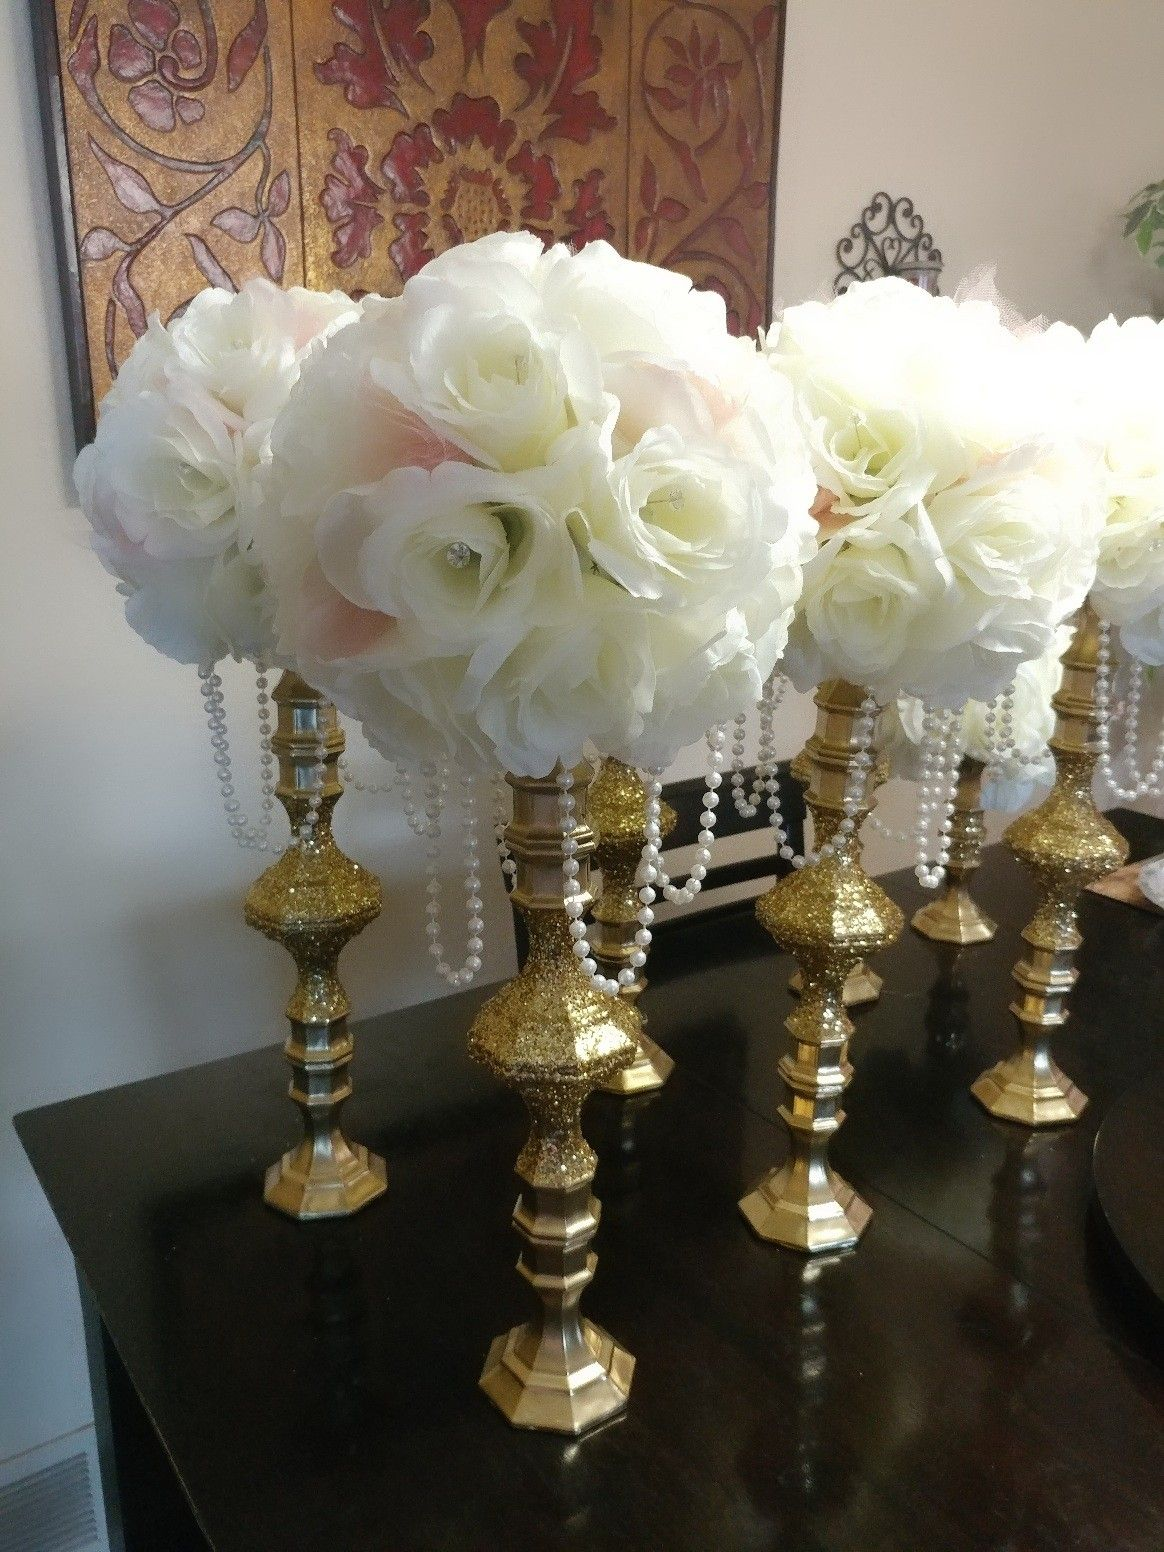 Wedding decorations dollar tree  Dollar Store Candle Holders  wedding ideas  Pinterest  Dollar